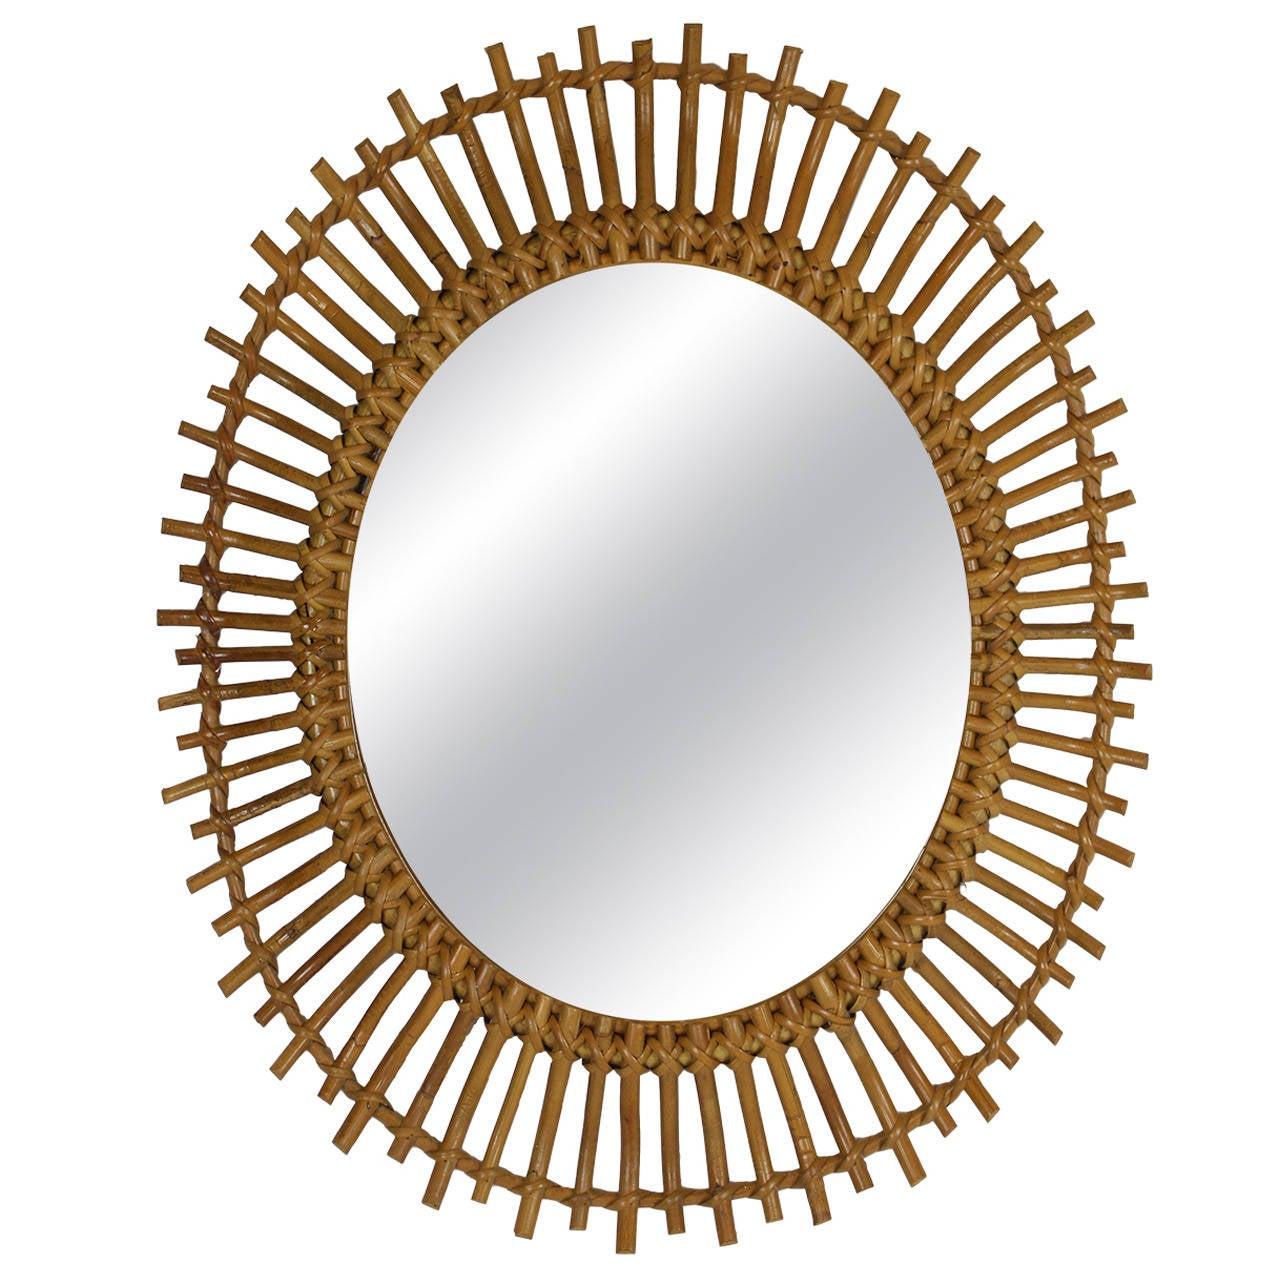 Bamboo And Rattan Sunburst Oval Mirror At 1stdibs